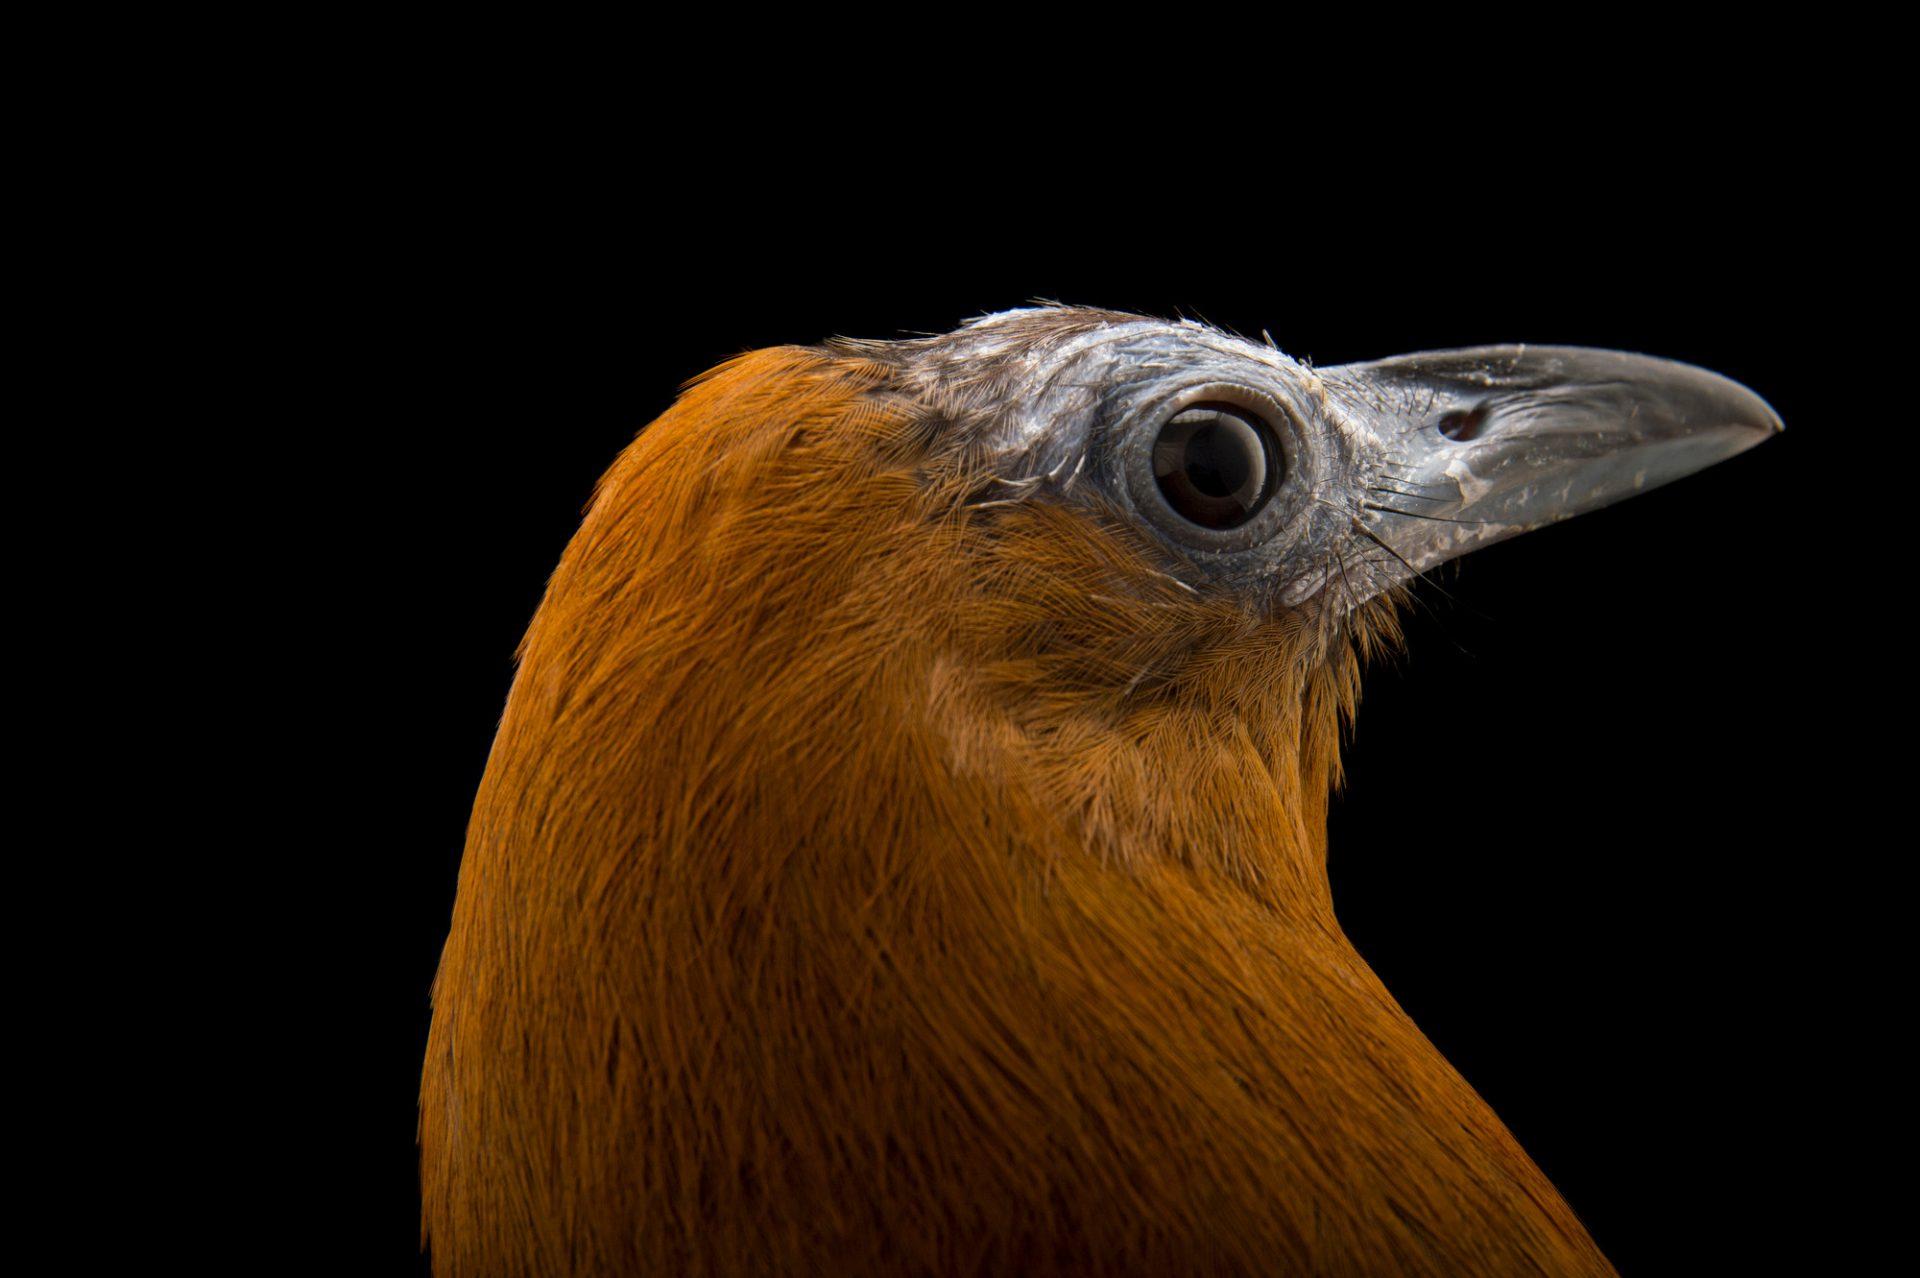 Picture of a capuchinbird (Perissocephalus tricolor) at the Dallas World Aquarium.